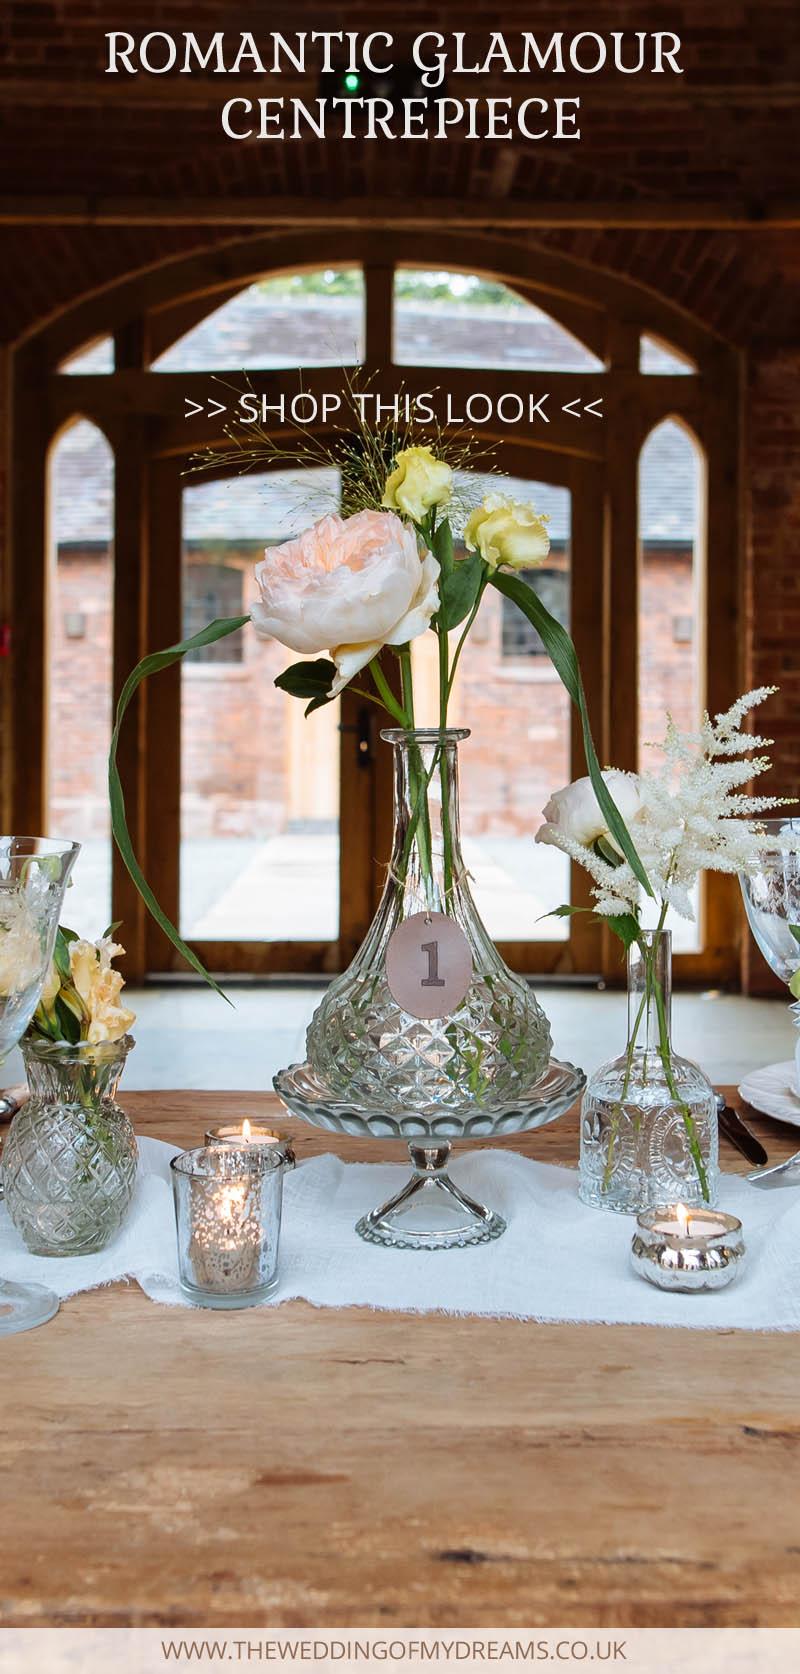 decanter wedding centrepiece romantic glamour wedding table decorations